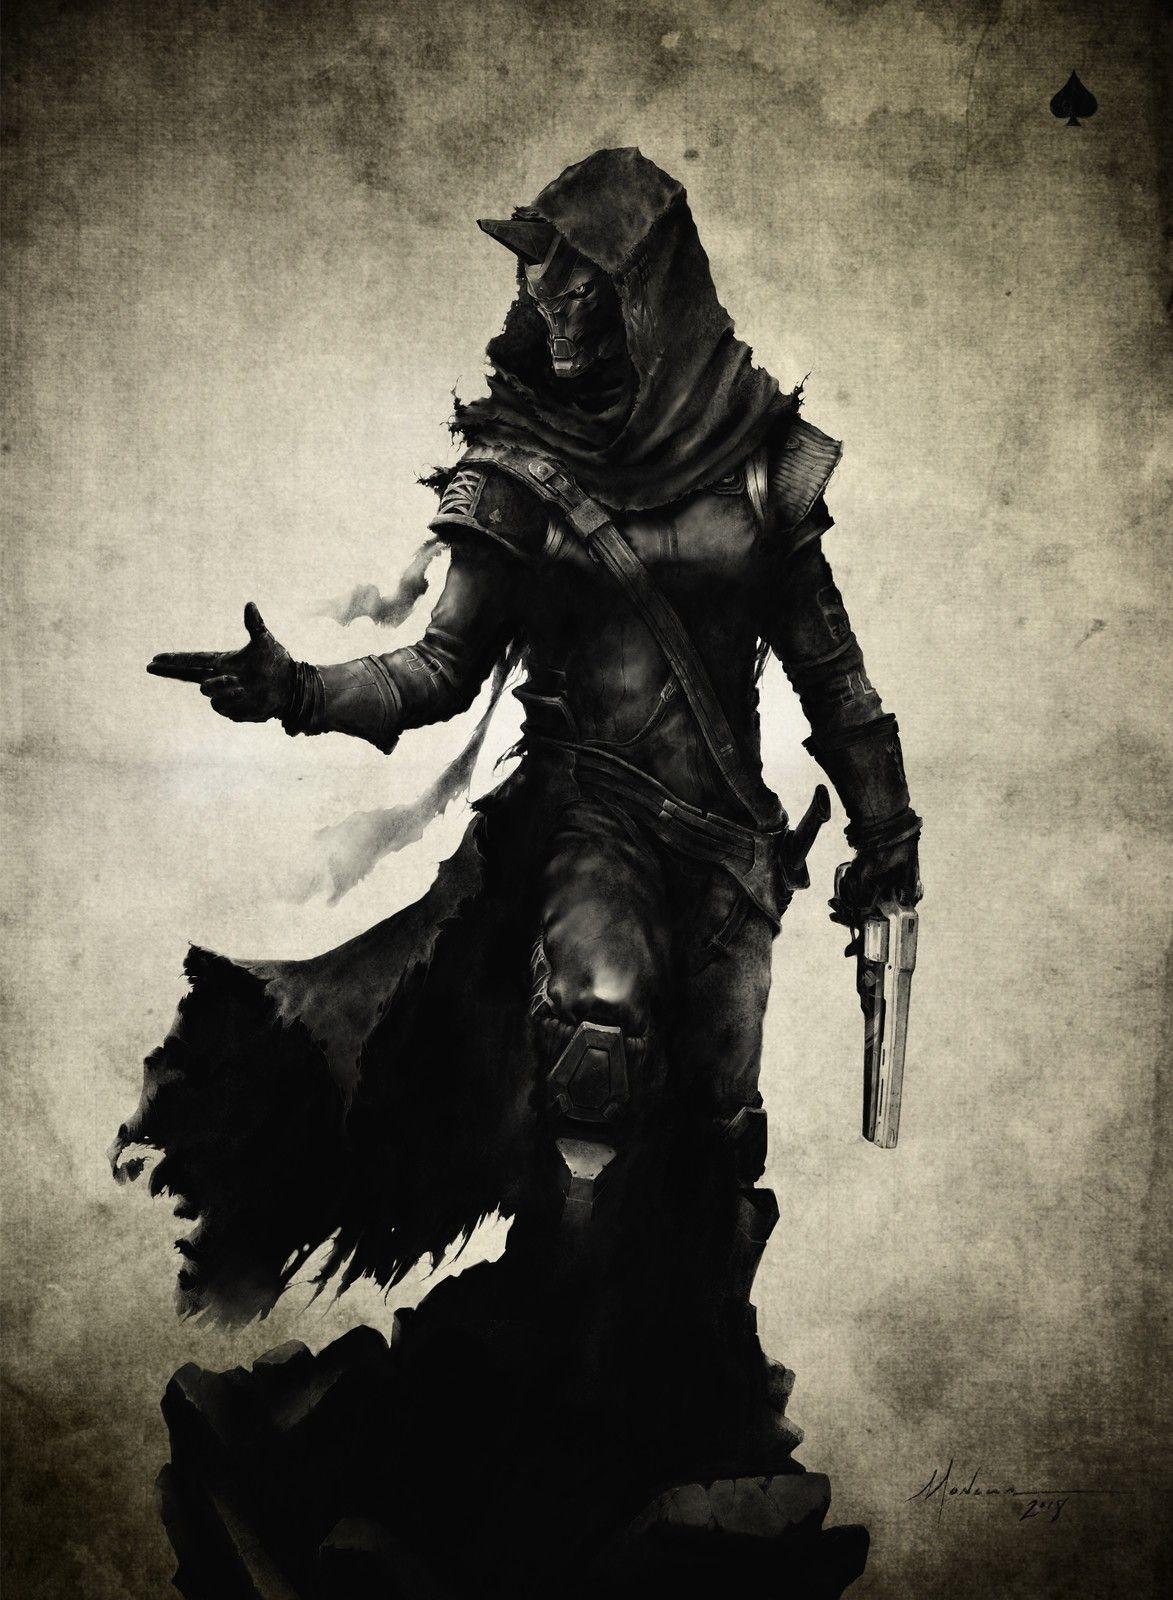 Cayde 6 Brian Moncus On Artstation At Https Www Artstation Com Artwork X56k0 Destiny Game Destiny Backgrounds Destiny Hunter